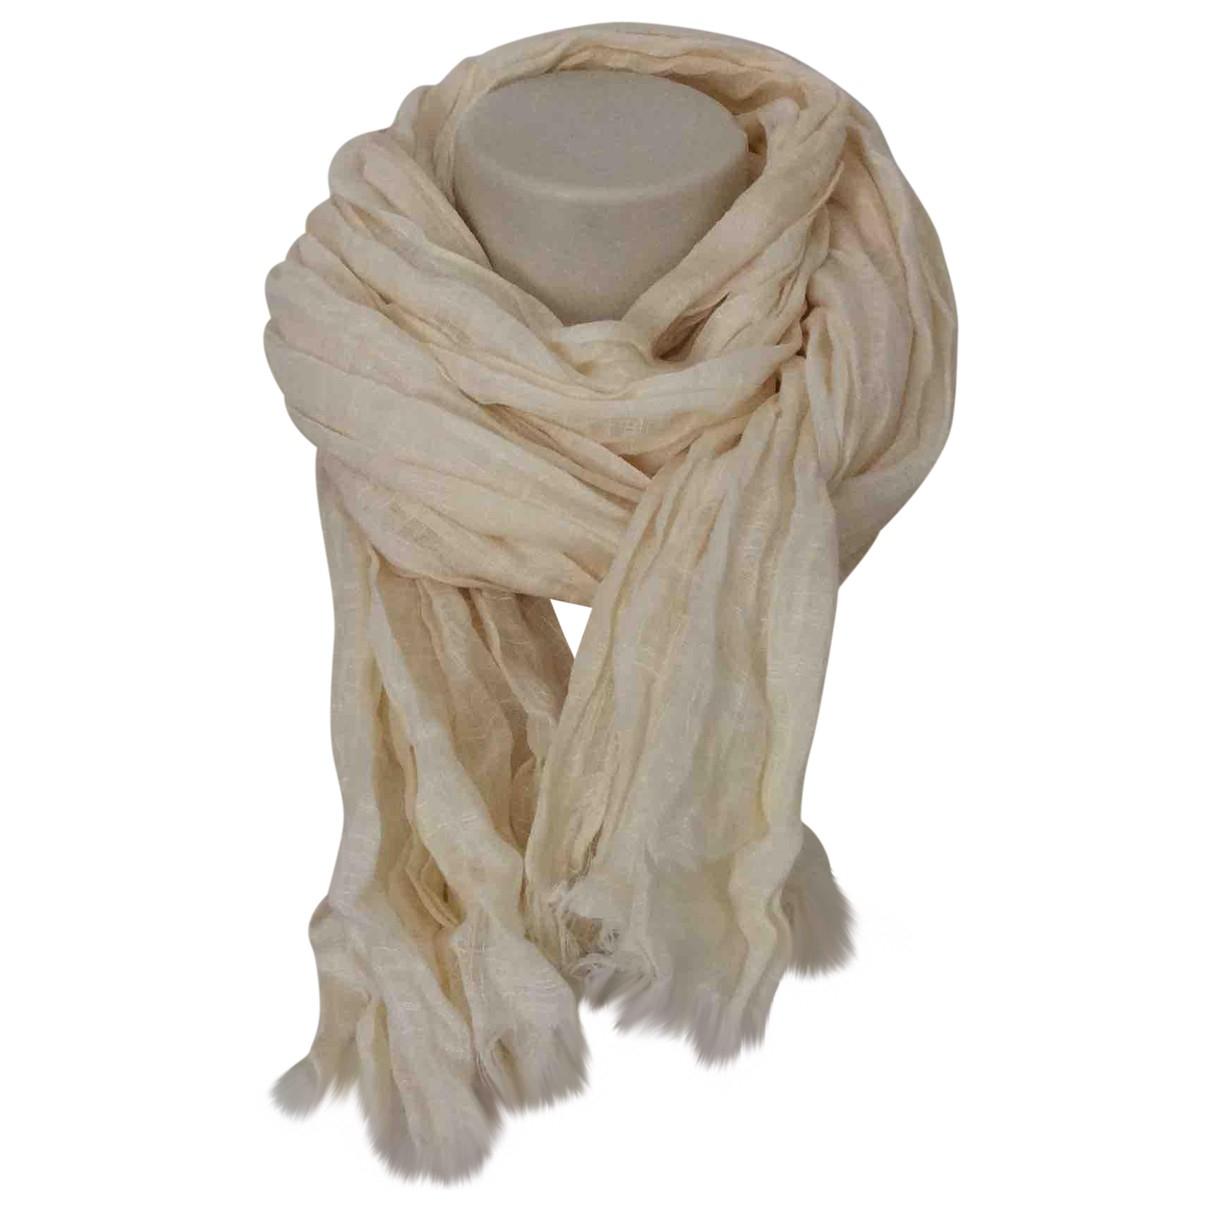 Max Mara \N Ecru Linen scarf for Women \N